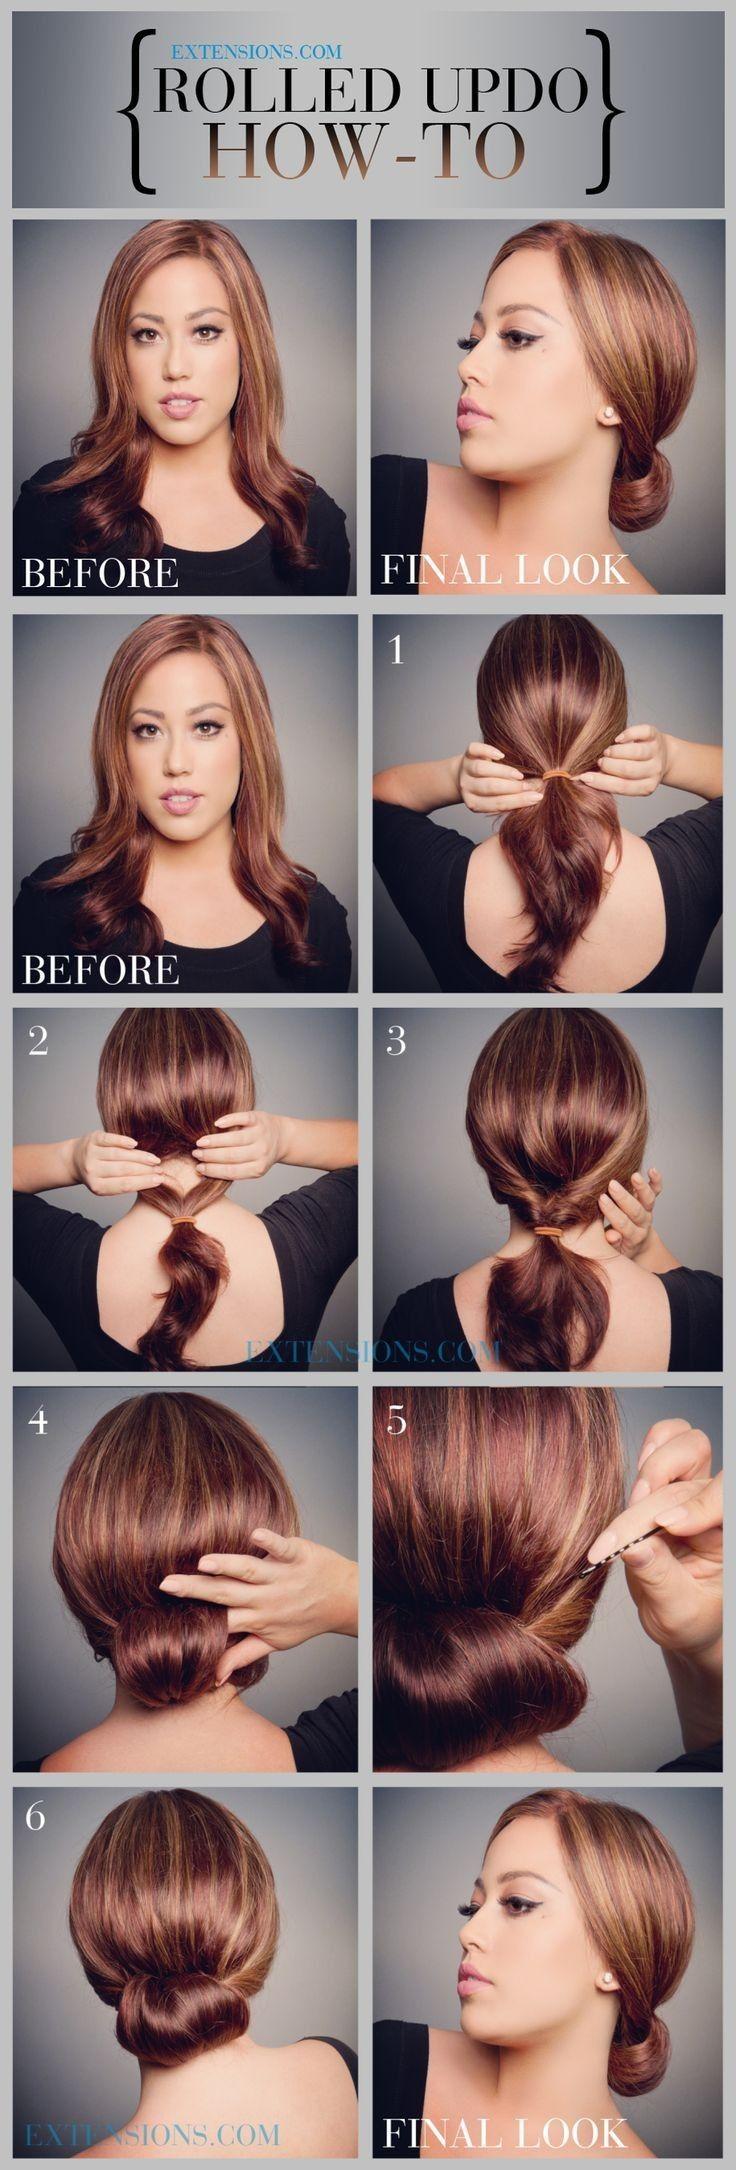 trendy low bun updo hairstyles tutorials easy cute low bun